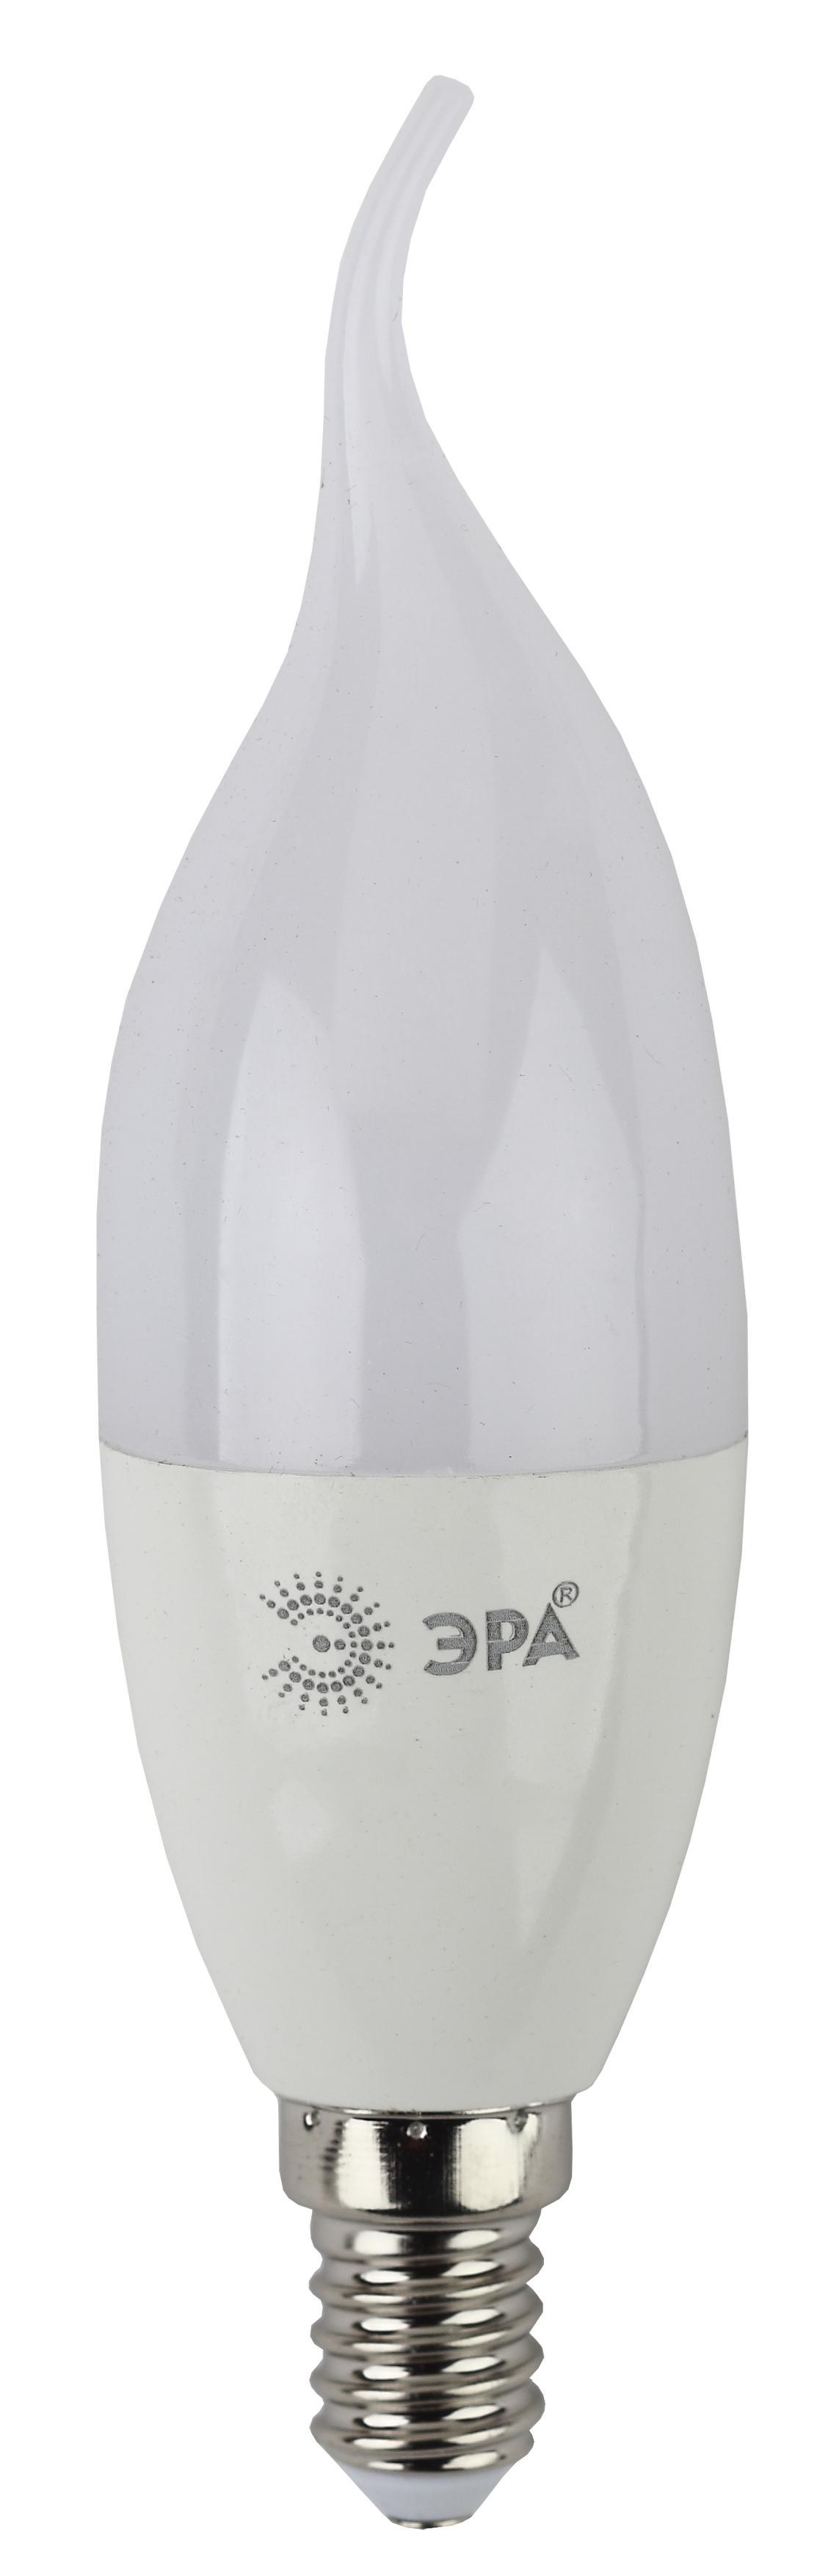 Лампа светодиодная ЭРА Led smd bxs-9w-840-e14